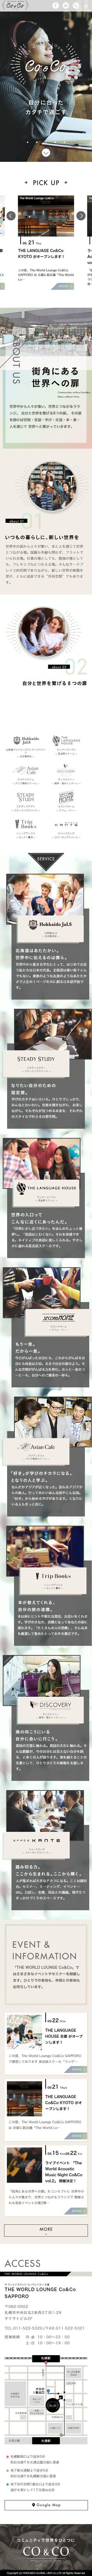 THE WORLD LOUNGE Co&Co SAPPORO様の「THE WORLD LOUNGE Co&Co SAPPORO」のスマホランディングページ(LP)シンプル系|サービス・保険・金融 #LP #ランディングページ #ランペ #THE WORLD LOUNGE Co&Co SAPPORO